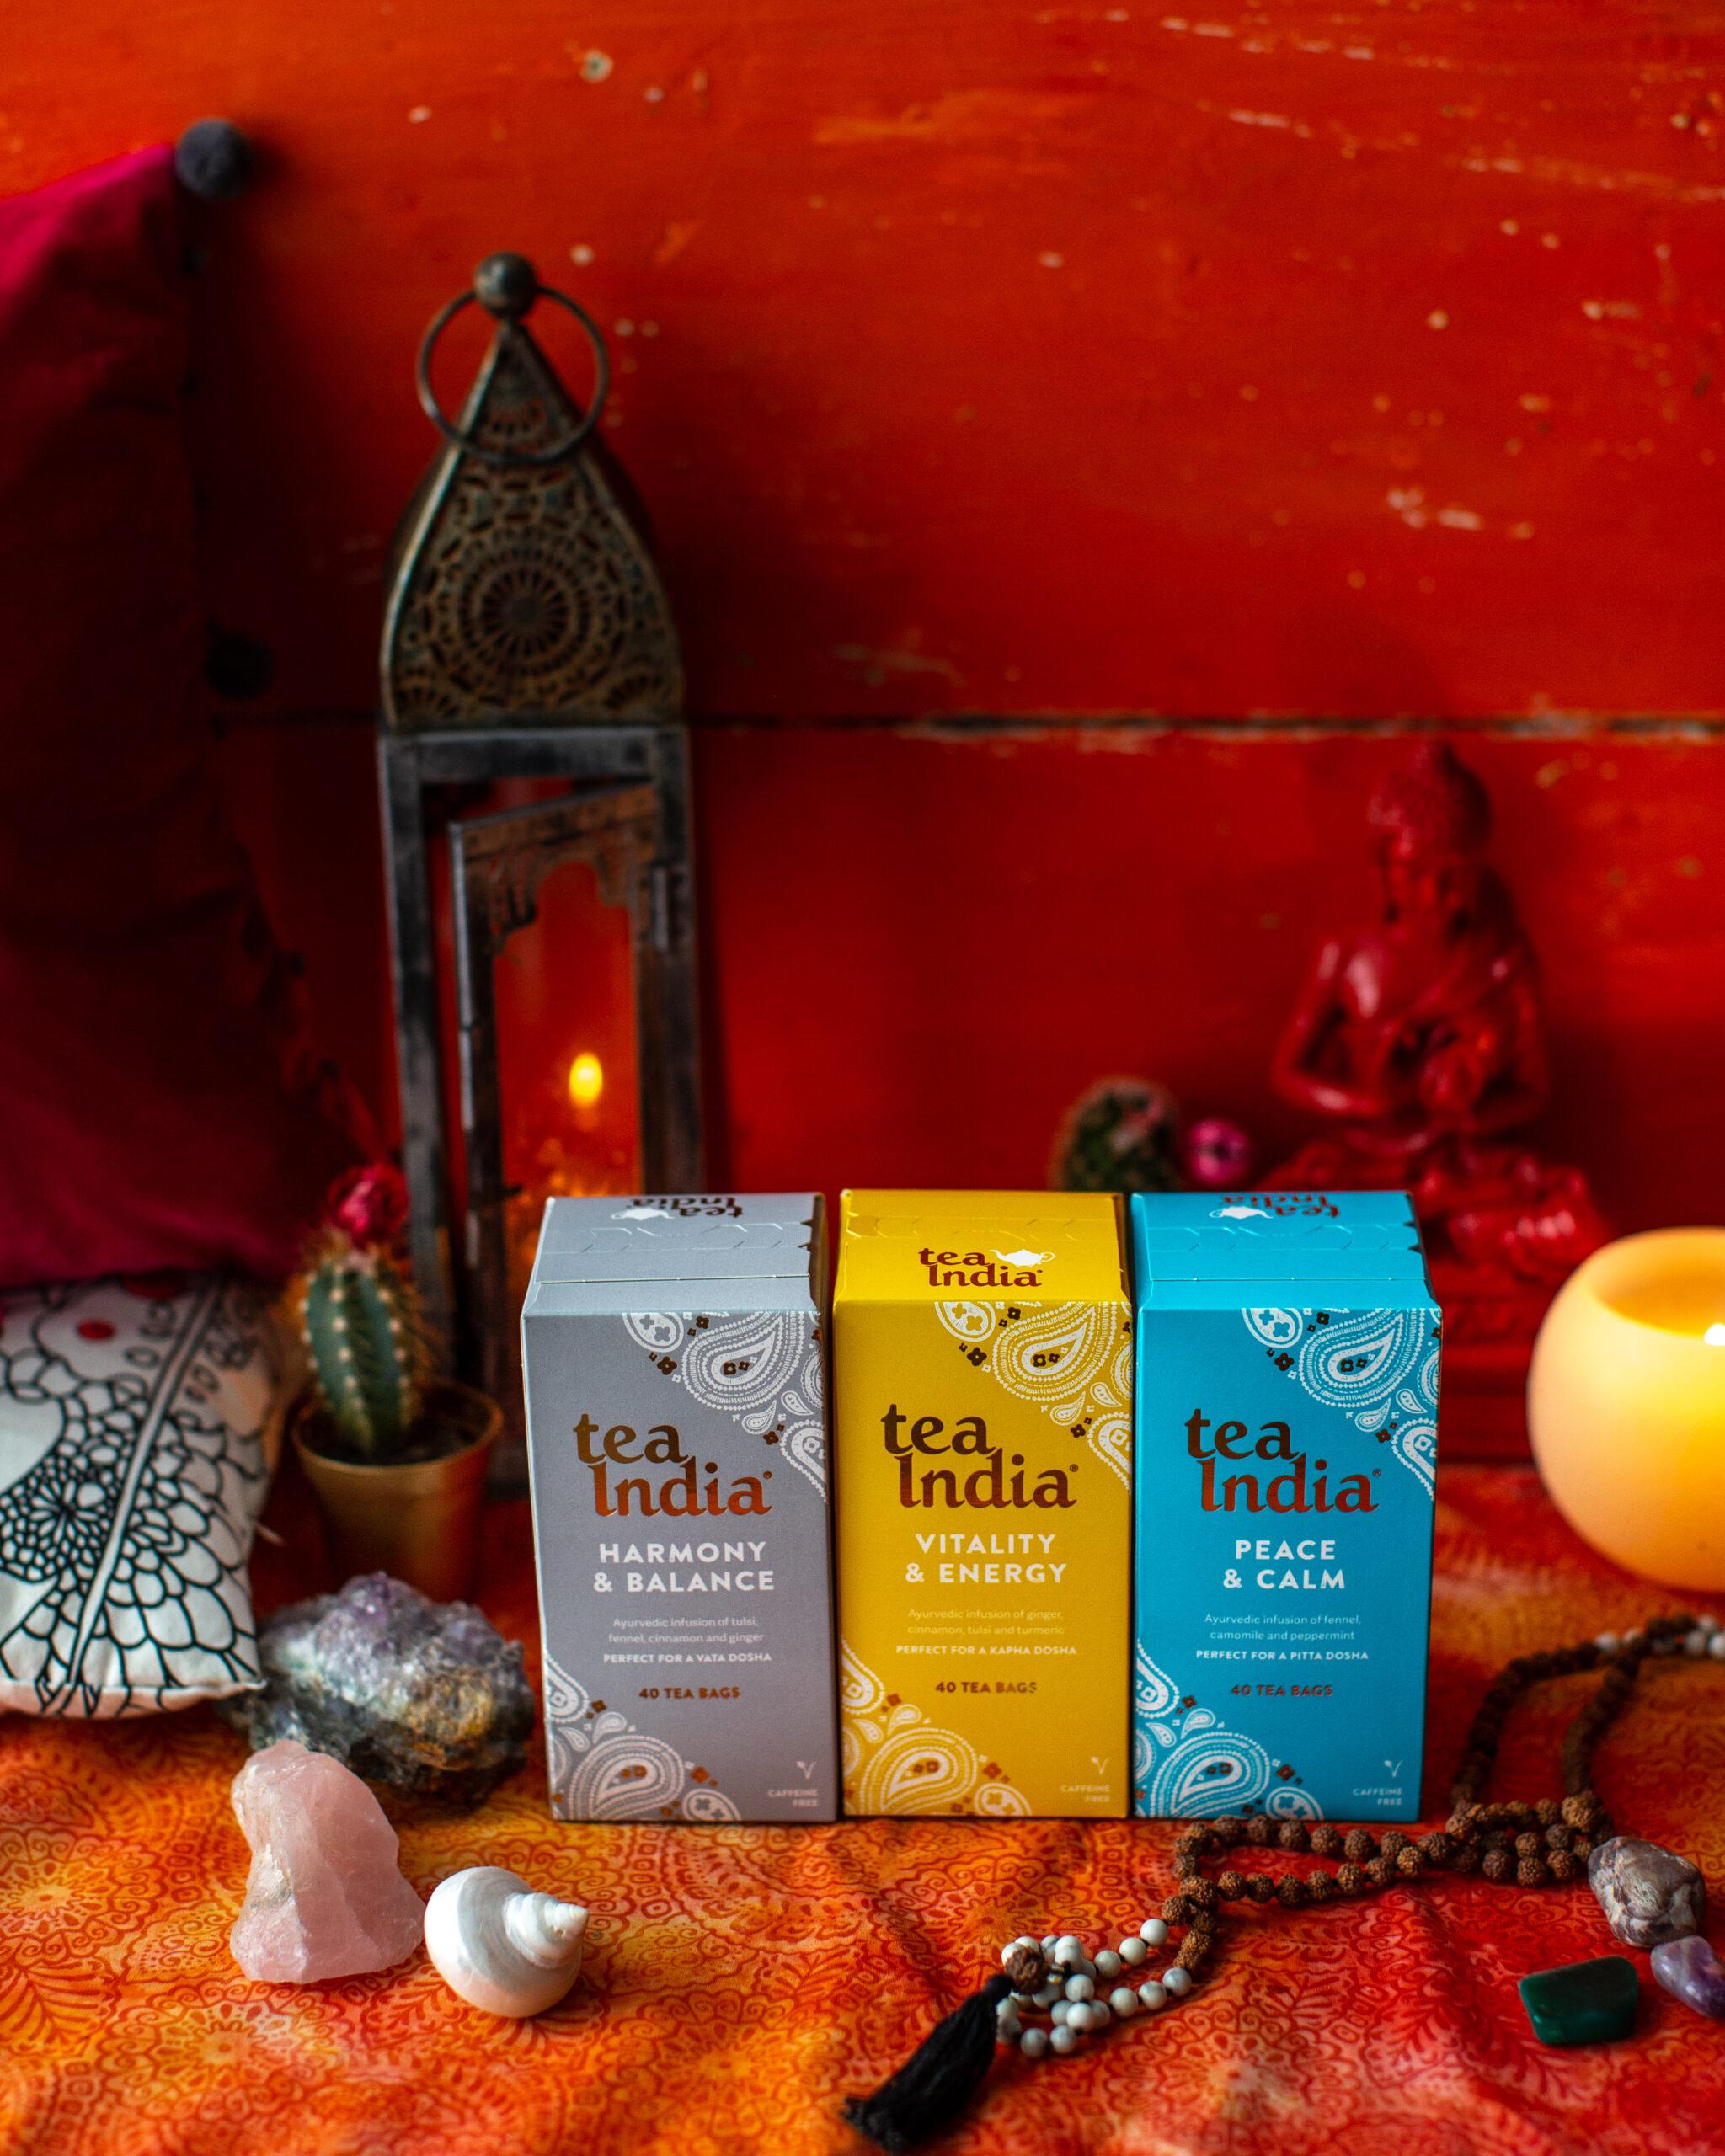 Tea India Ayurvedic Tea